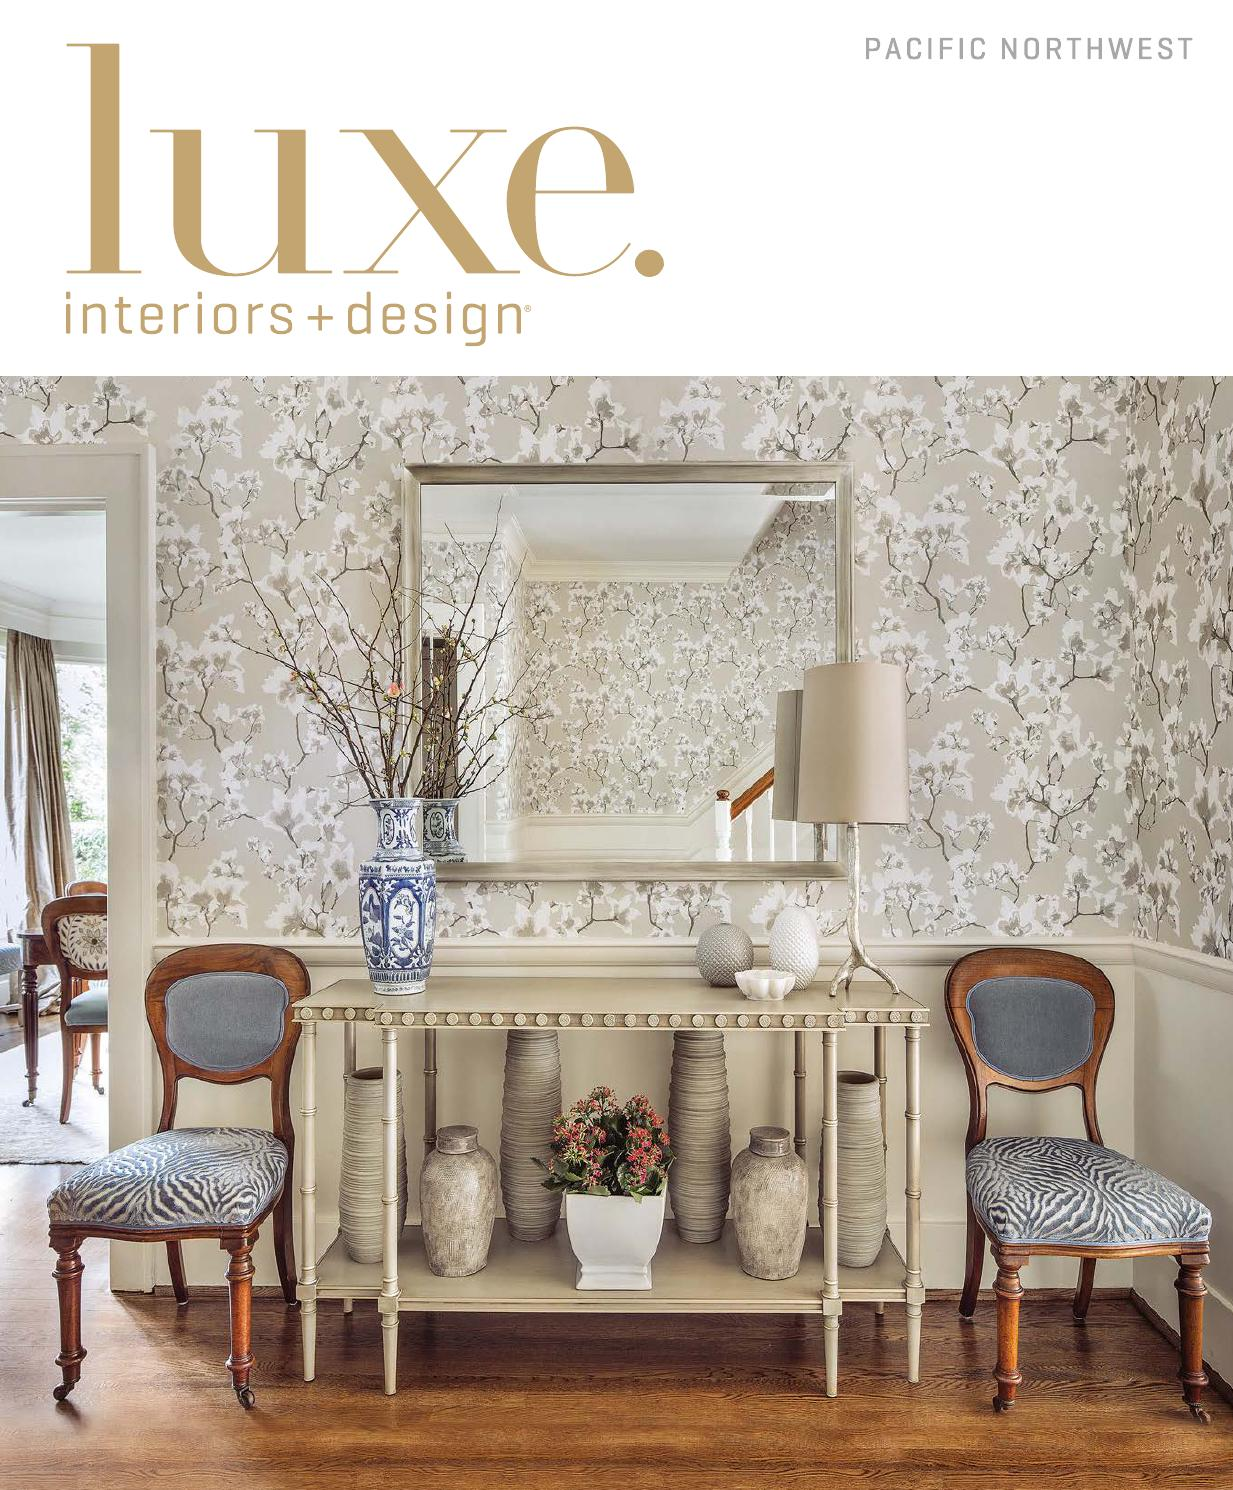 Luxe Magazine November 2015 Pacific Northwest By Sandow Issuu